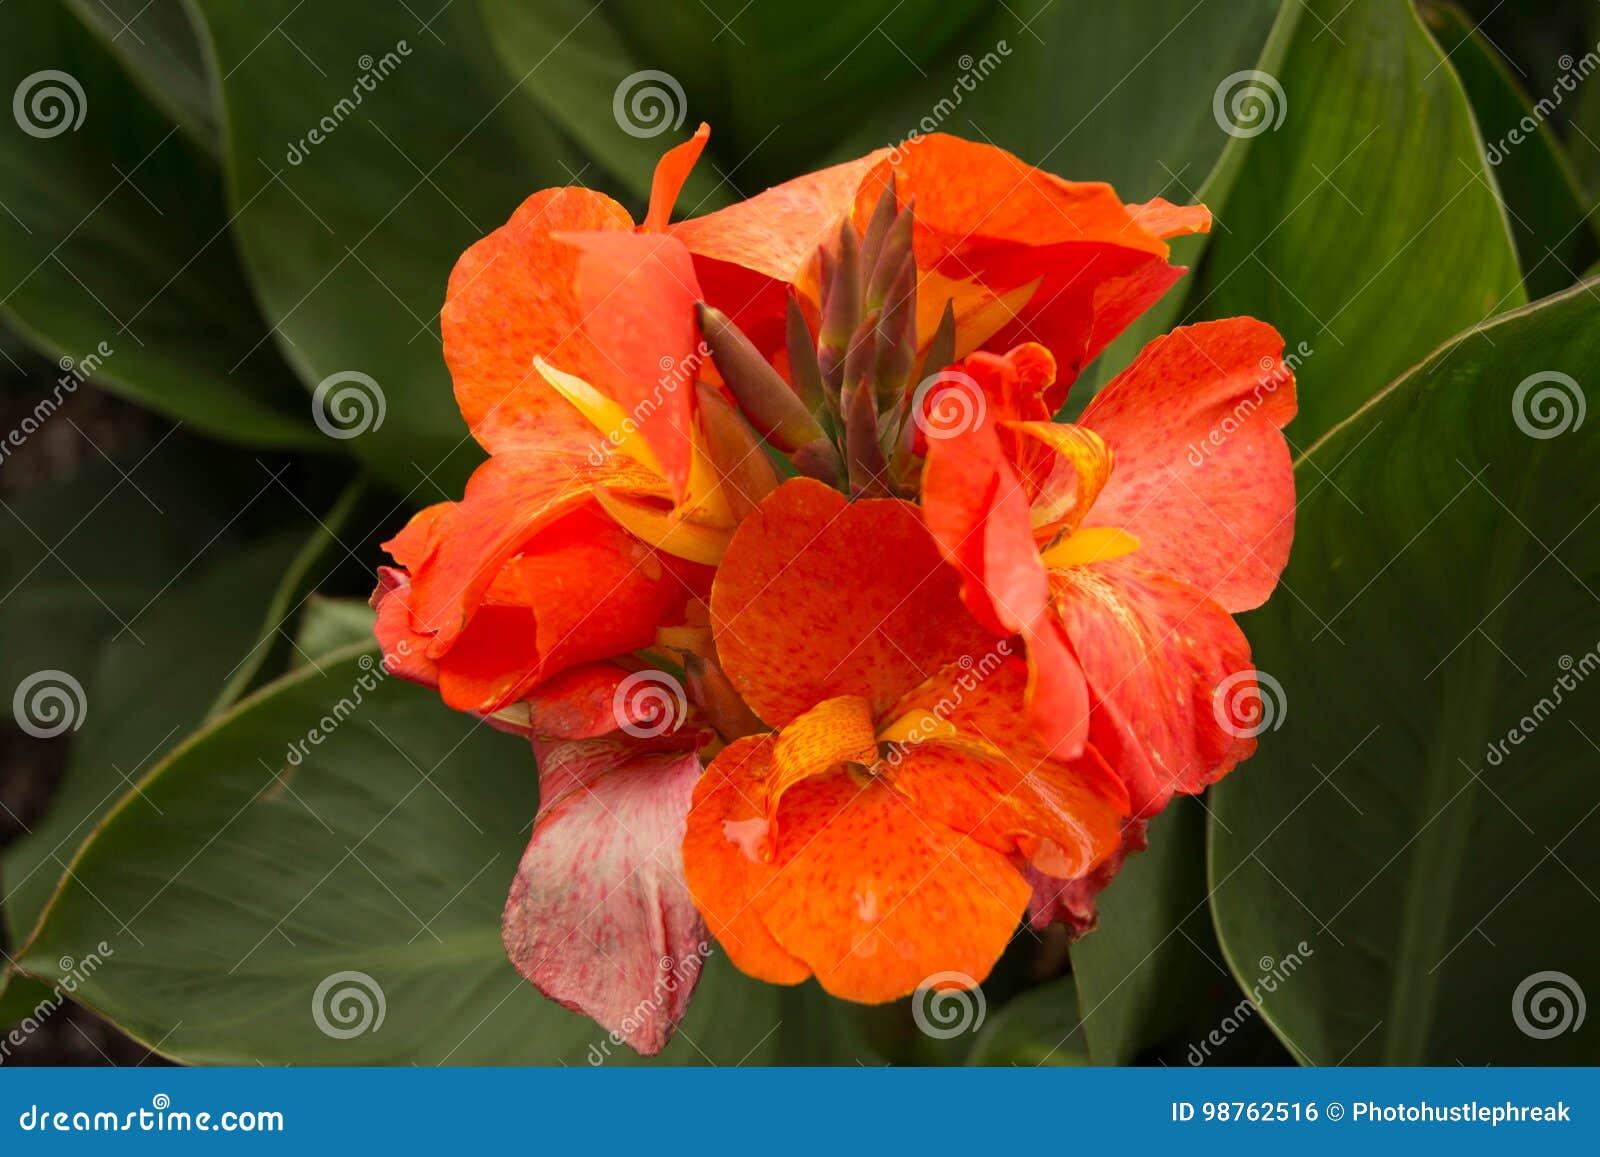 Fleur Orange De Canna Photo Stock Image Du Developpez 98762516